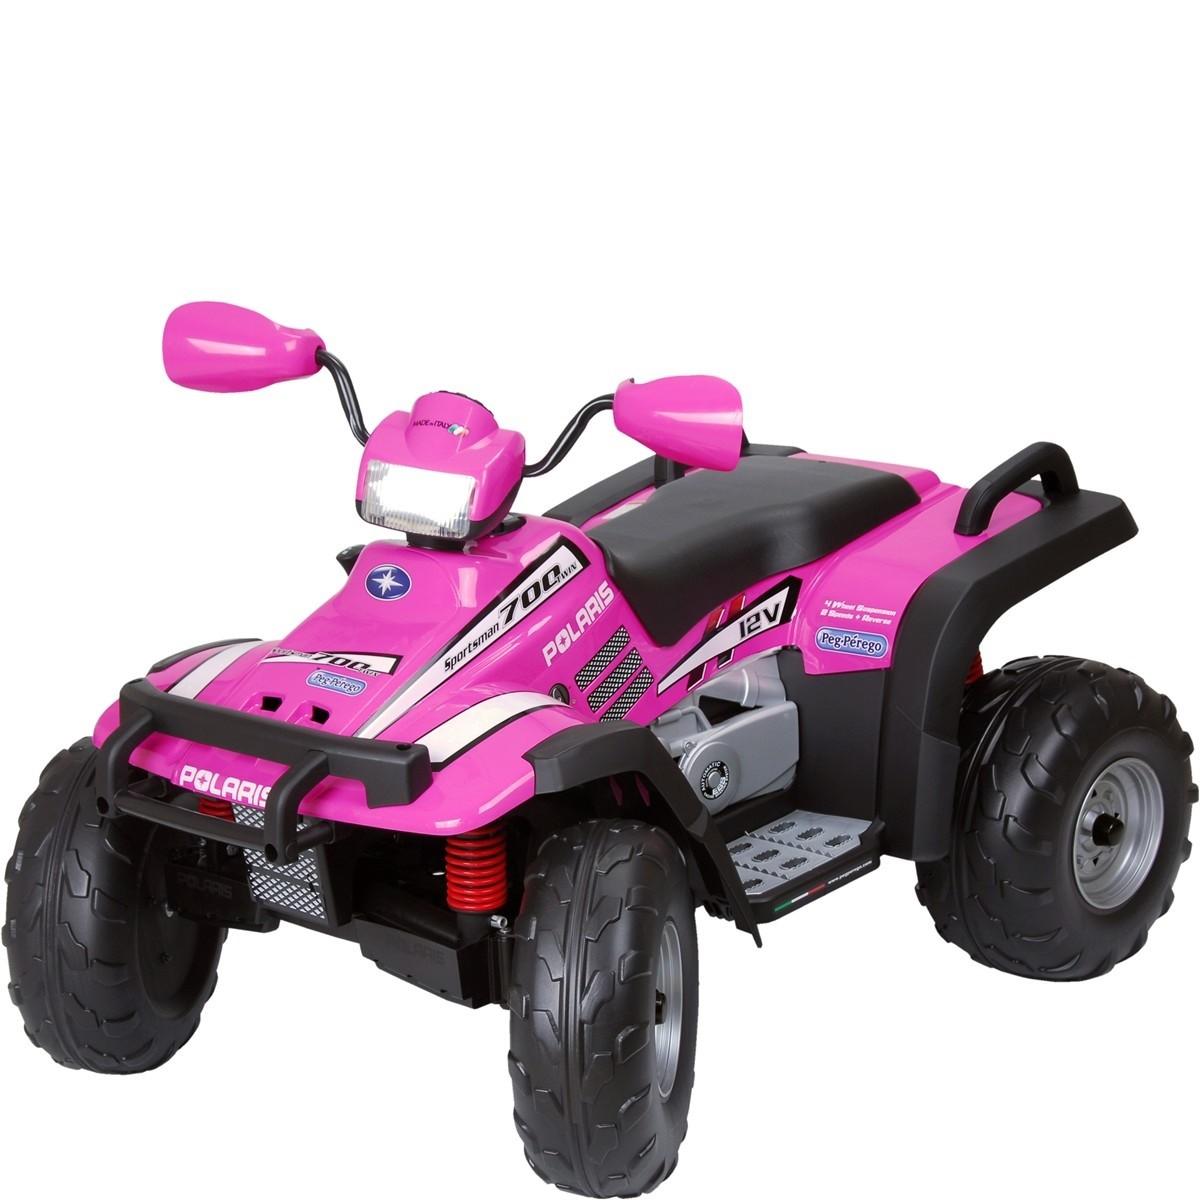 Quadriciclo Polaris Sportsman Pink - 12V